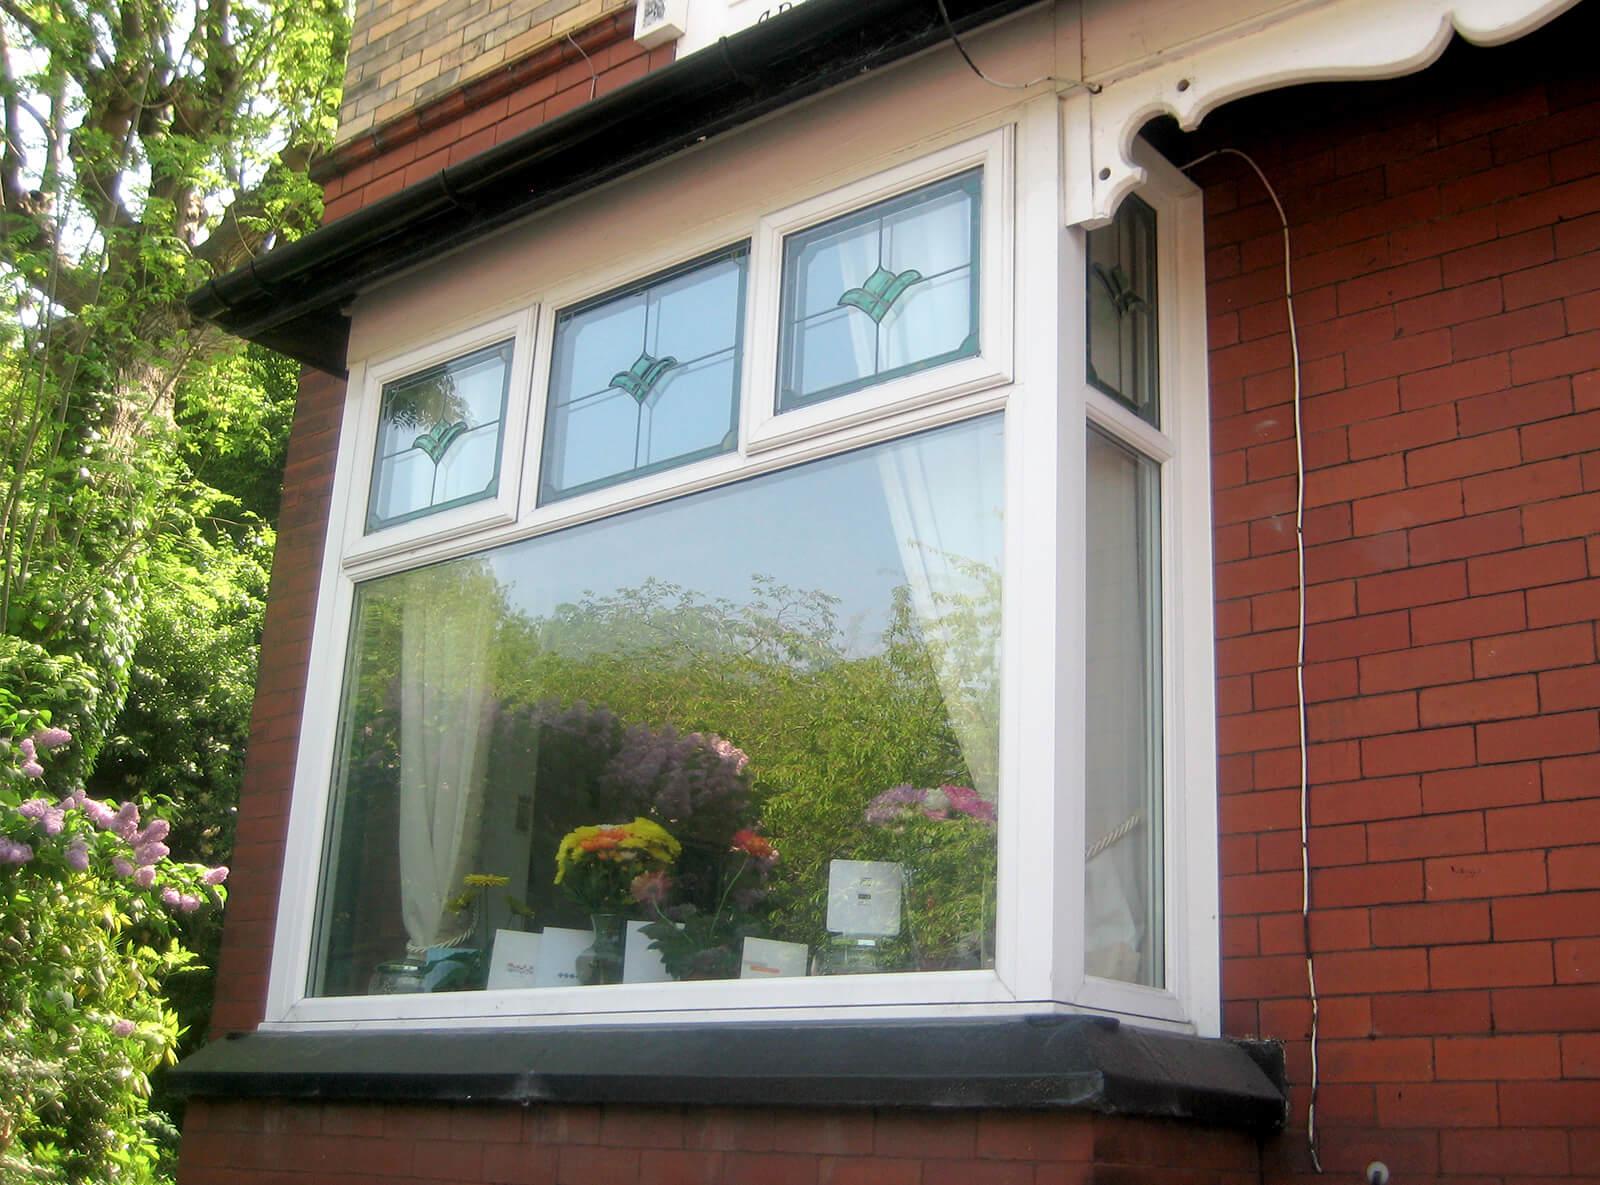 Pleasing Window Replacement In Greater Manchester Droylsden Glass Ltd Interior Design Ideas Truasarkarijobsexamcom